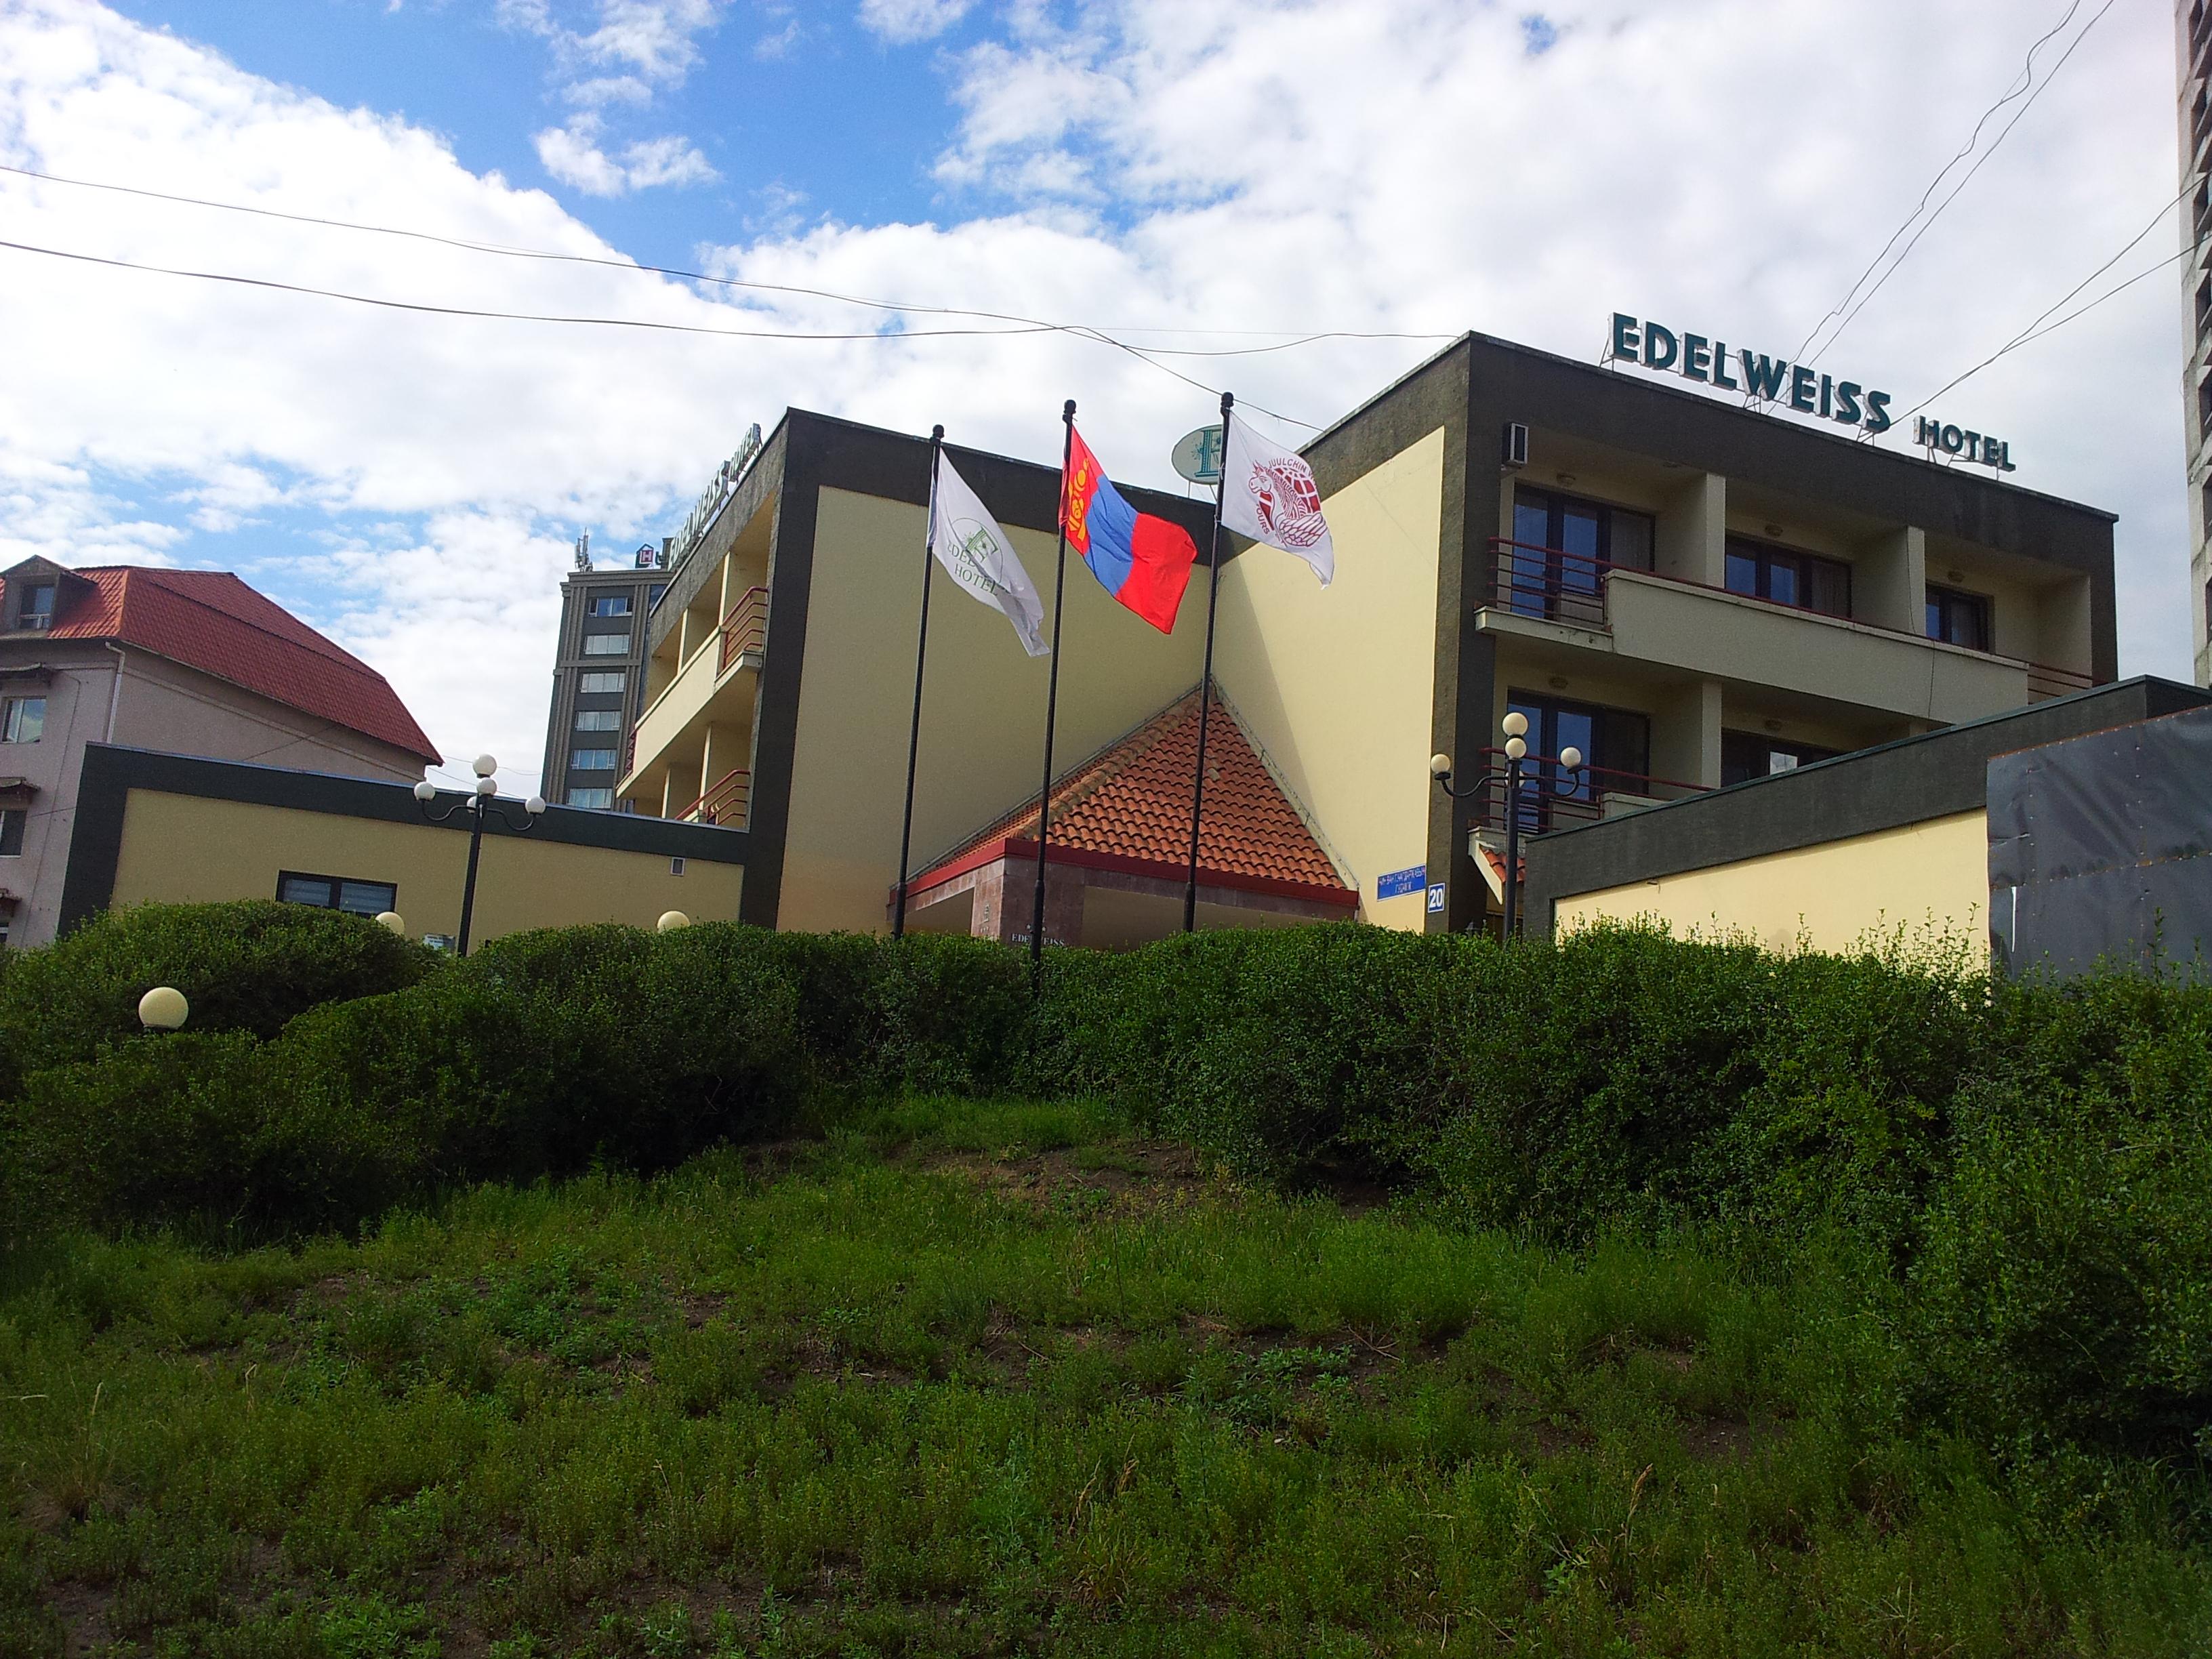 Edelweiss hotel in Ulaanbaatar city